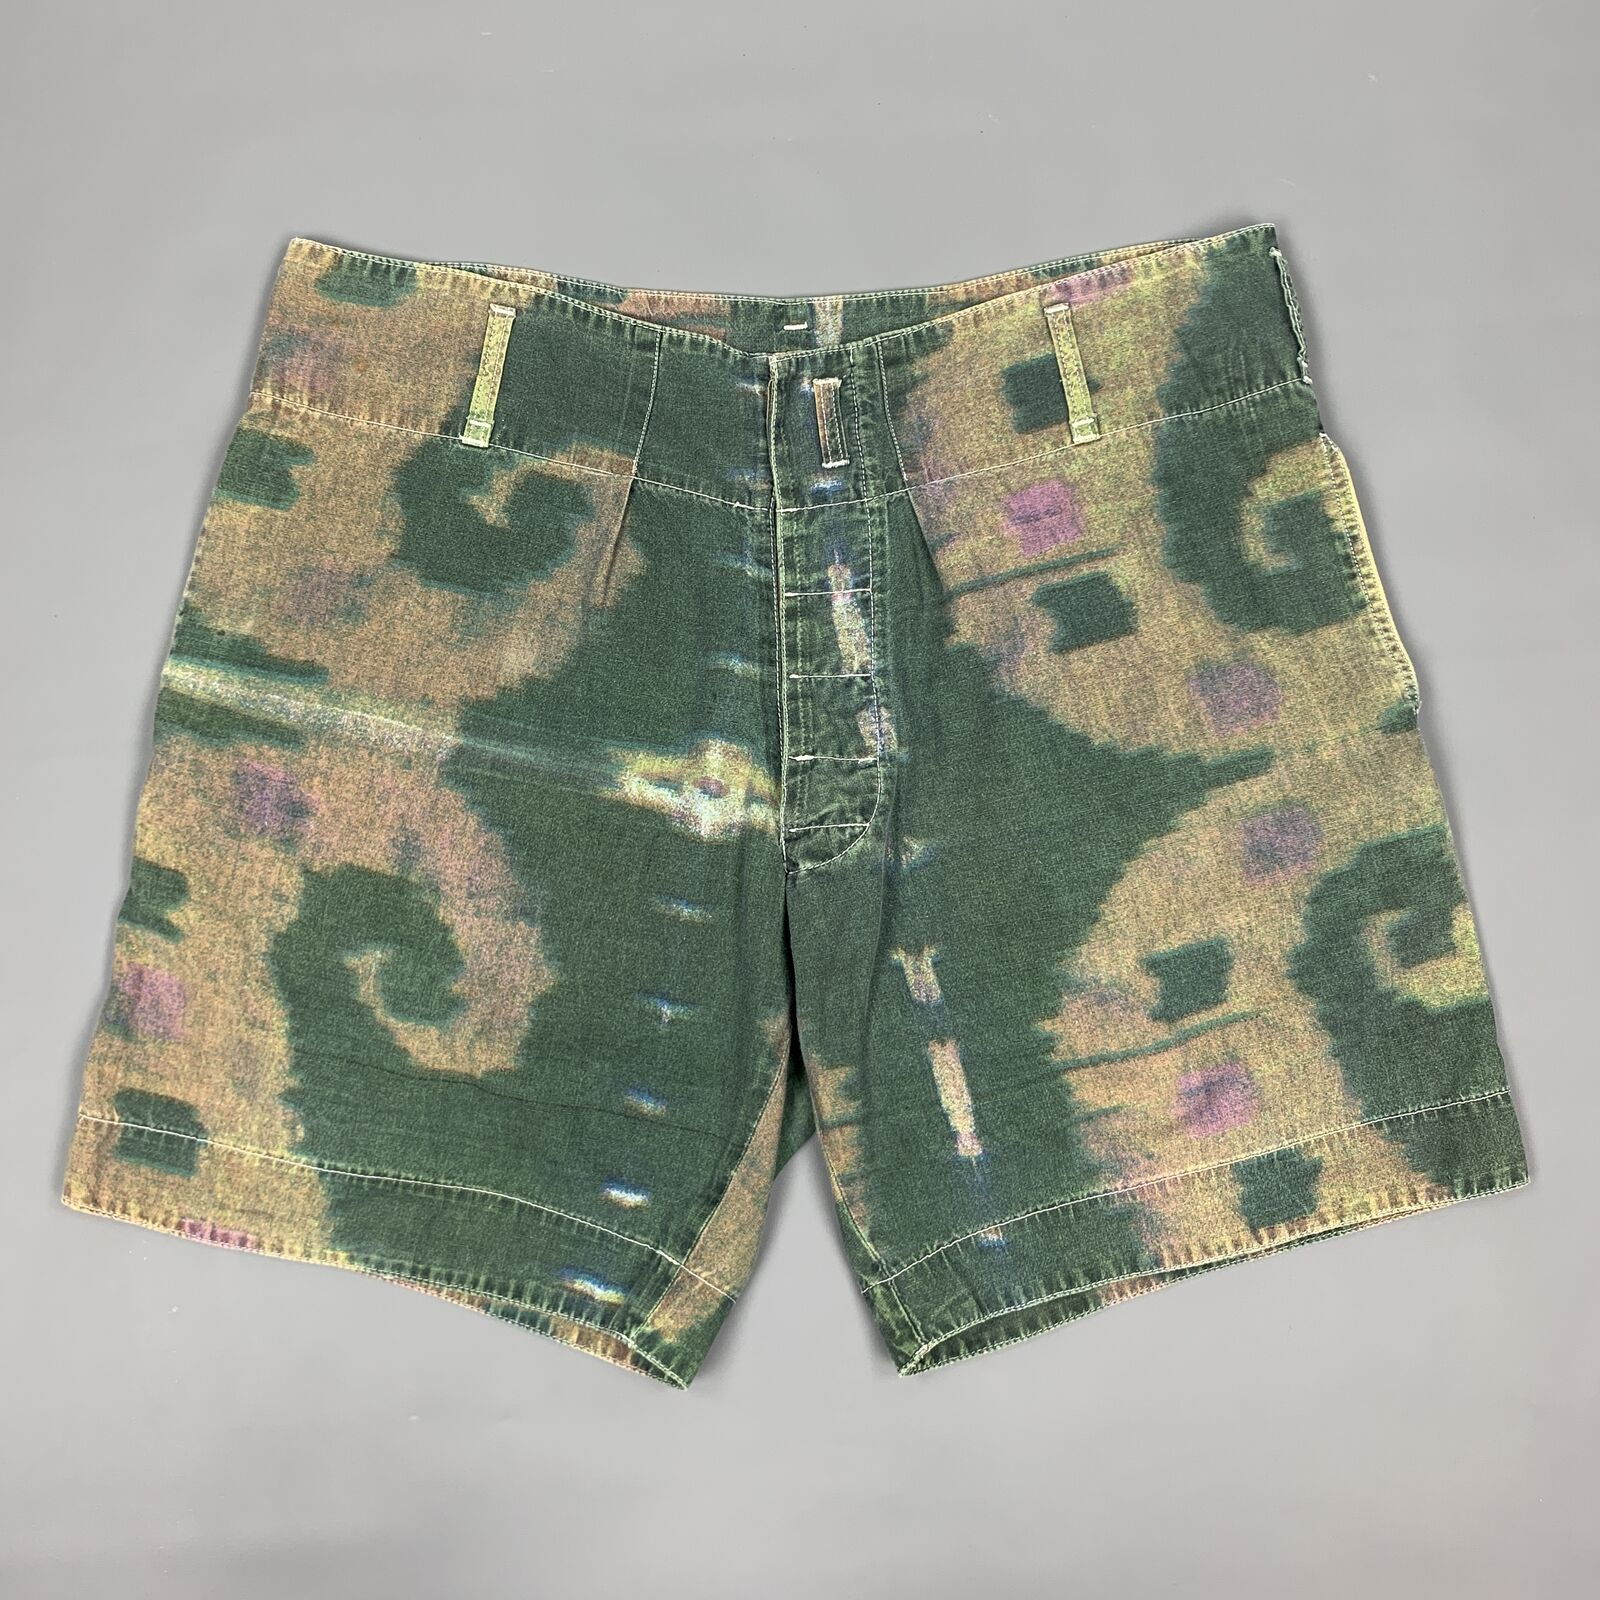 Vintage ARMANI JEANS Size 32 Olive Print Cotton Oversized Shorts